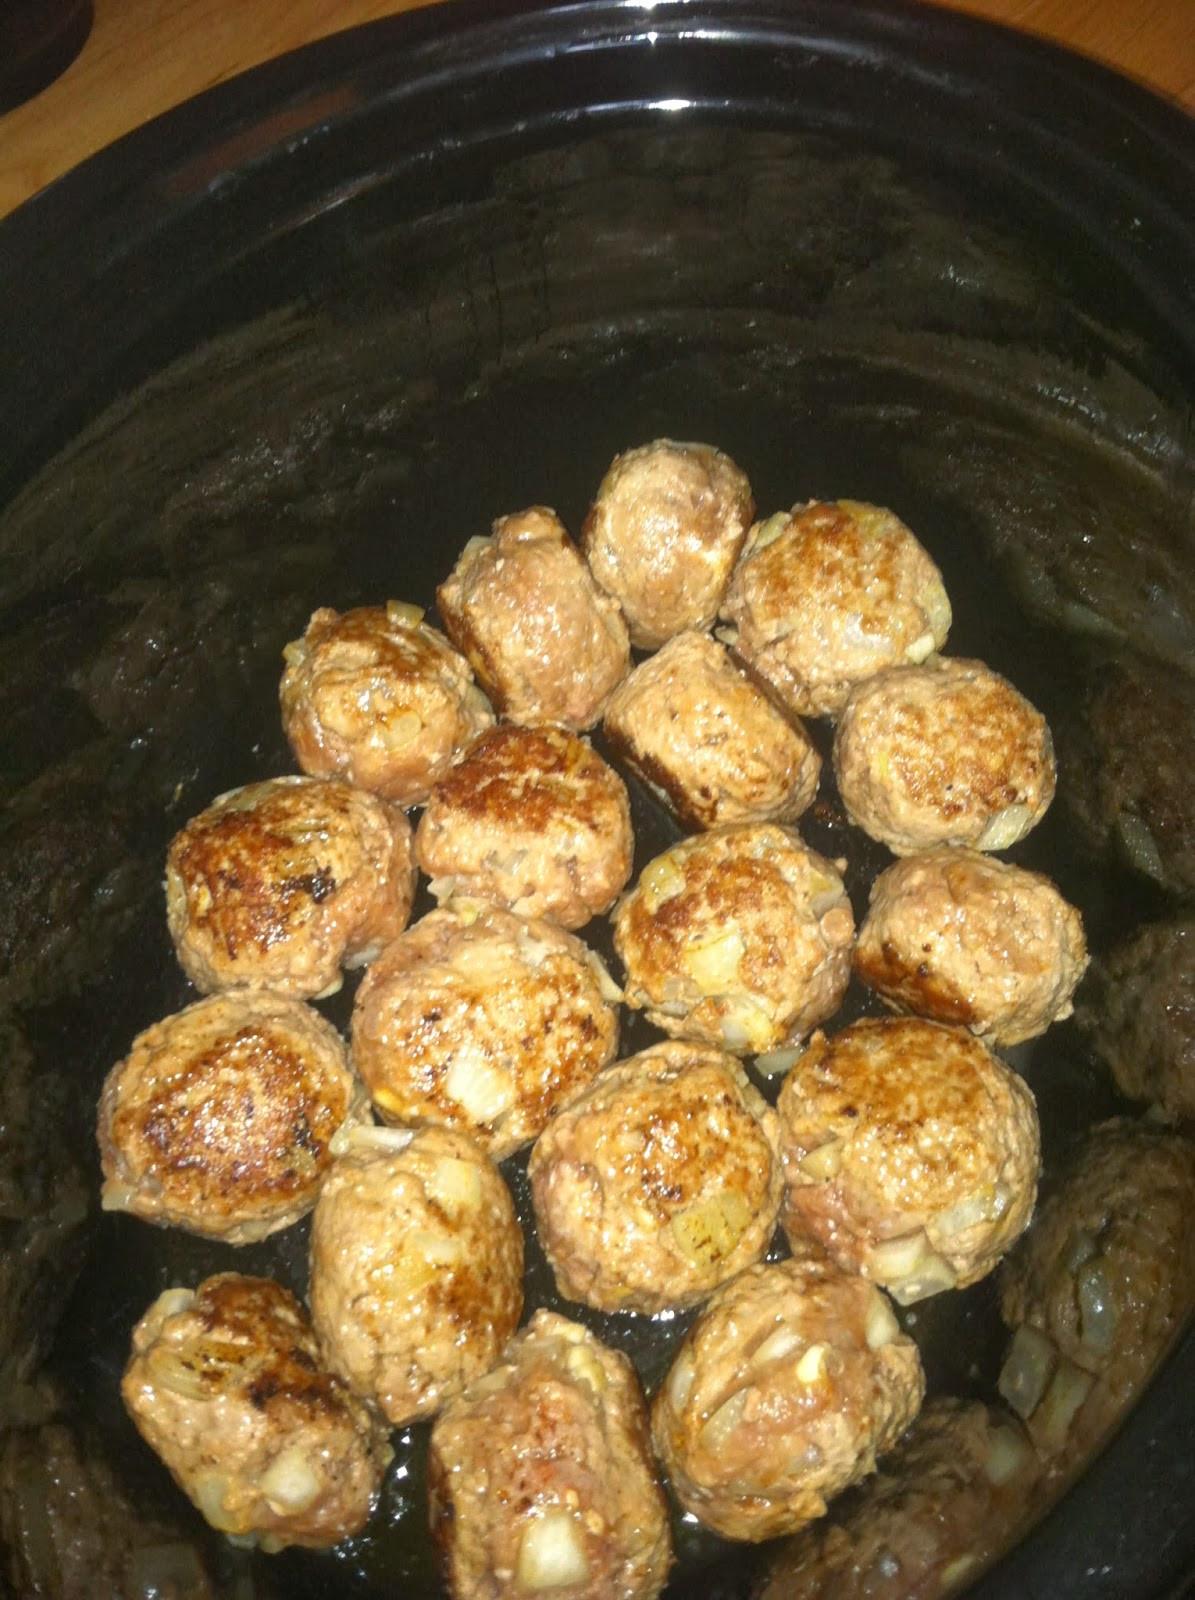 Easy Crock Pot Keto  Sid Sisters Easy low carb keto Crockpot Meatballs